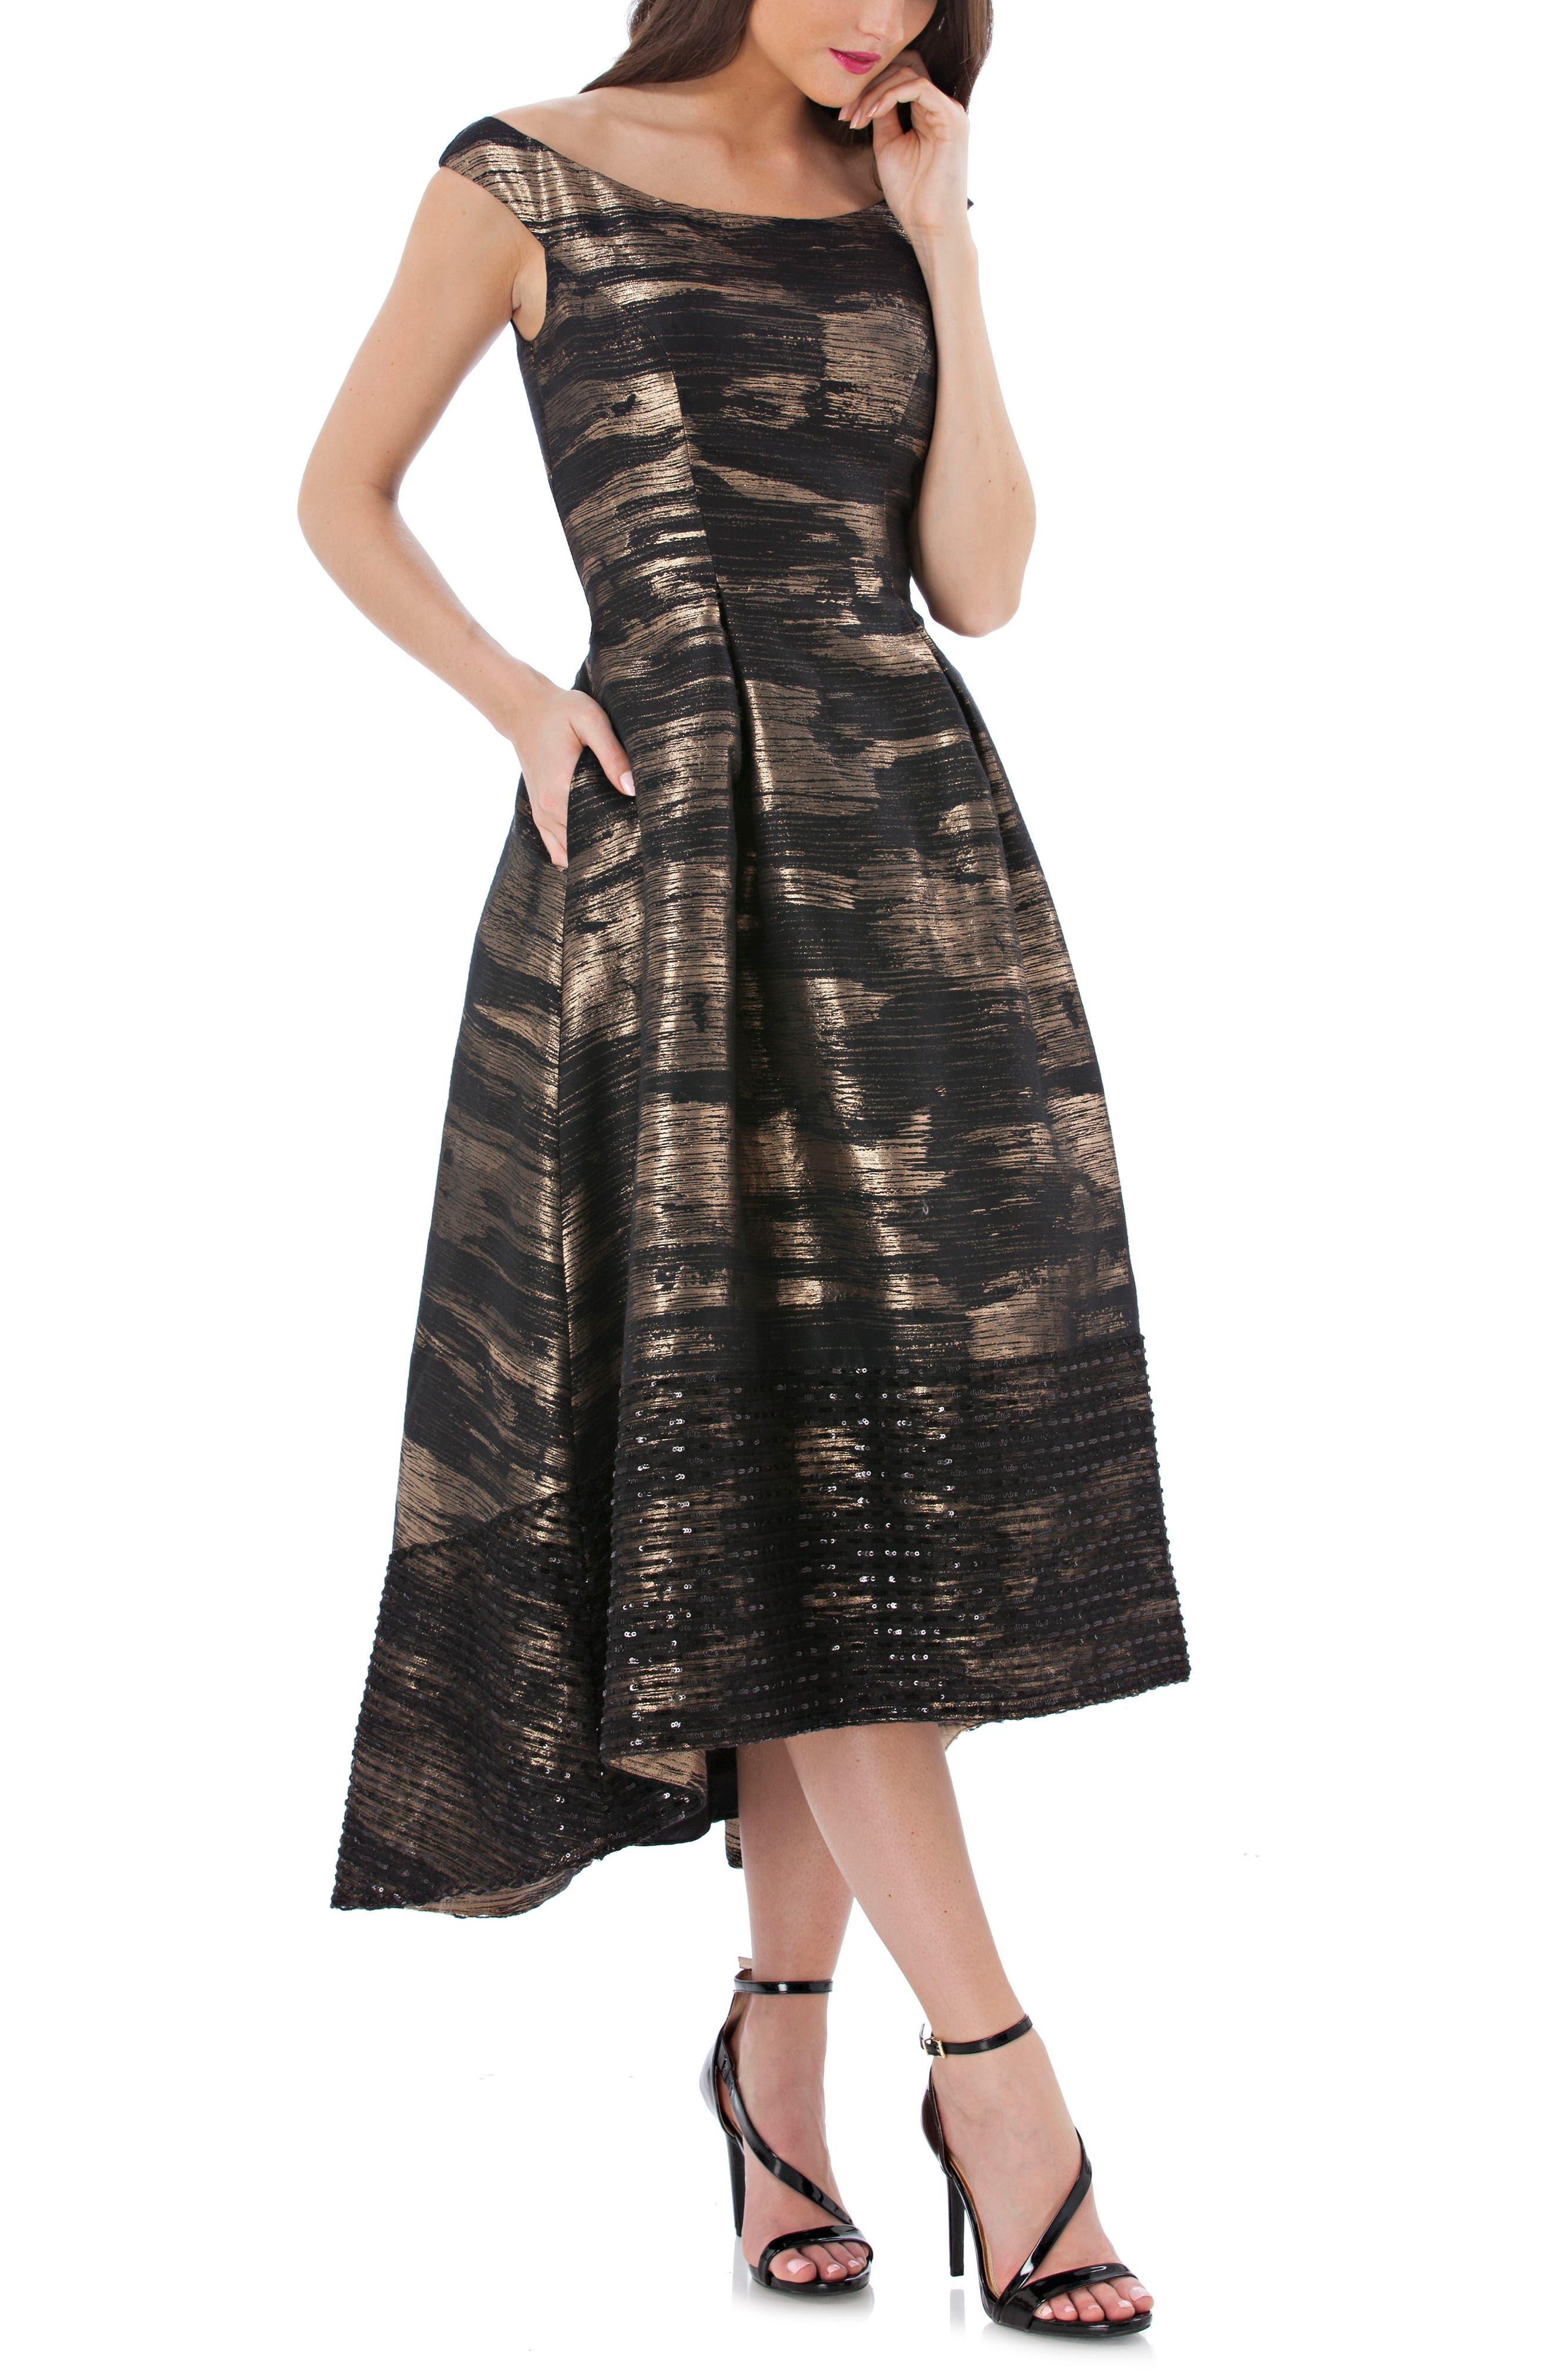 CARMEN MARC VALVO INFUSION Brocade Off The Shoulder Dress, Black ...